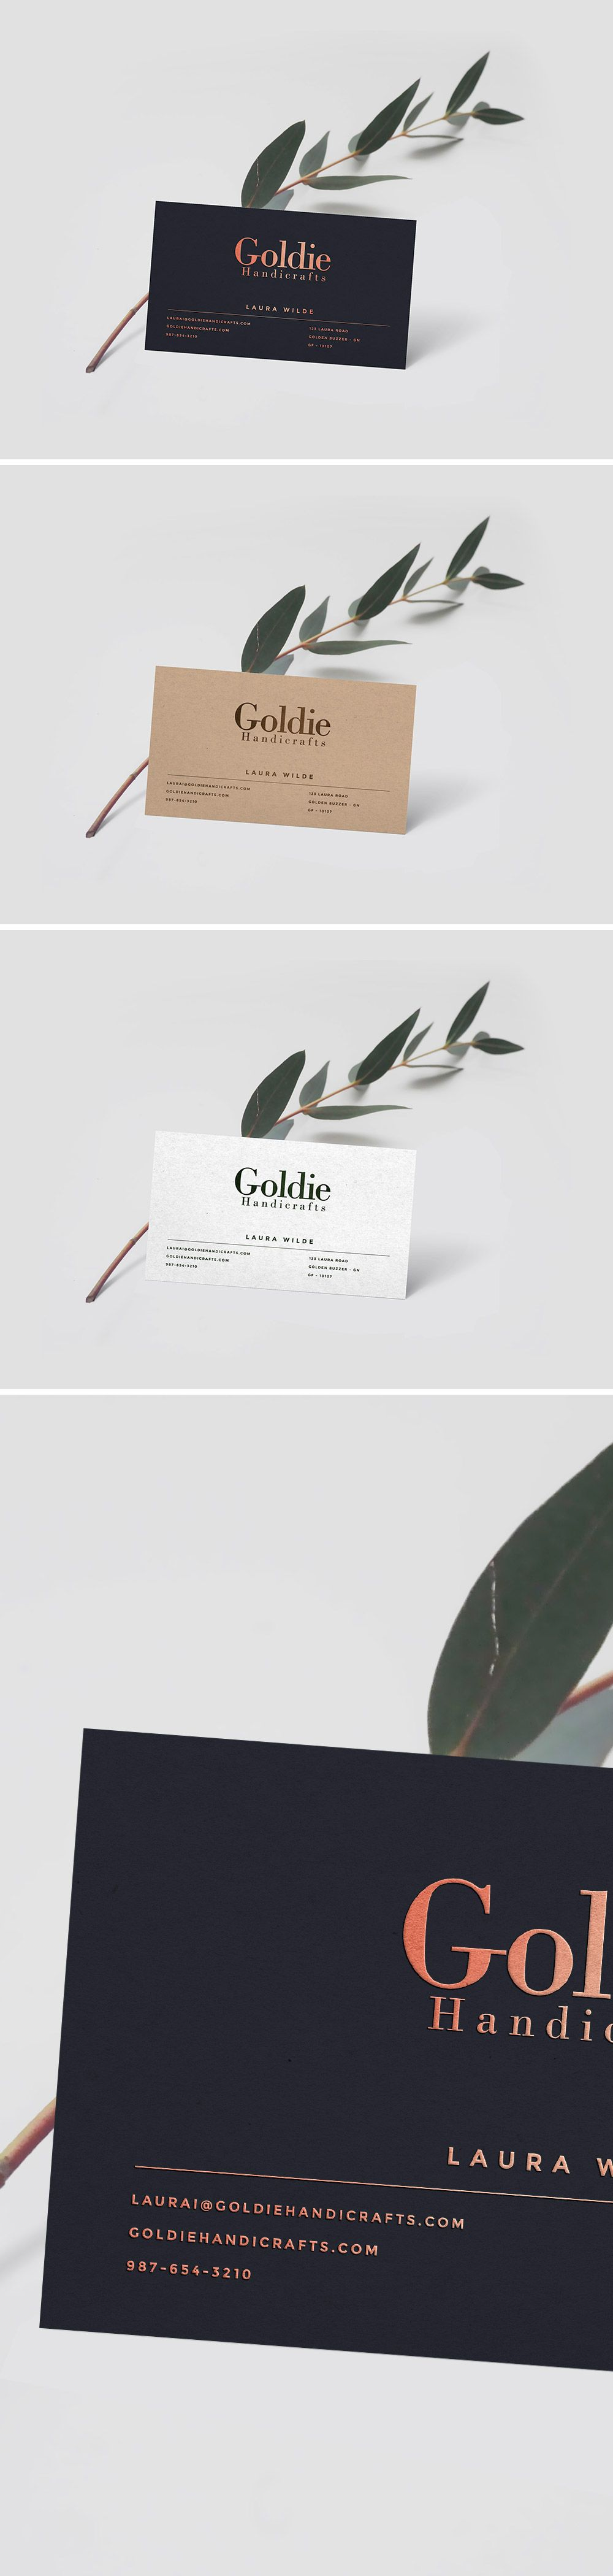 Realistic business card mockup psd mockup business cards and realistic business card mockup reheart Images